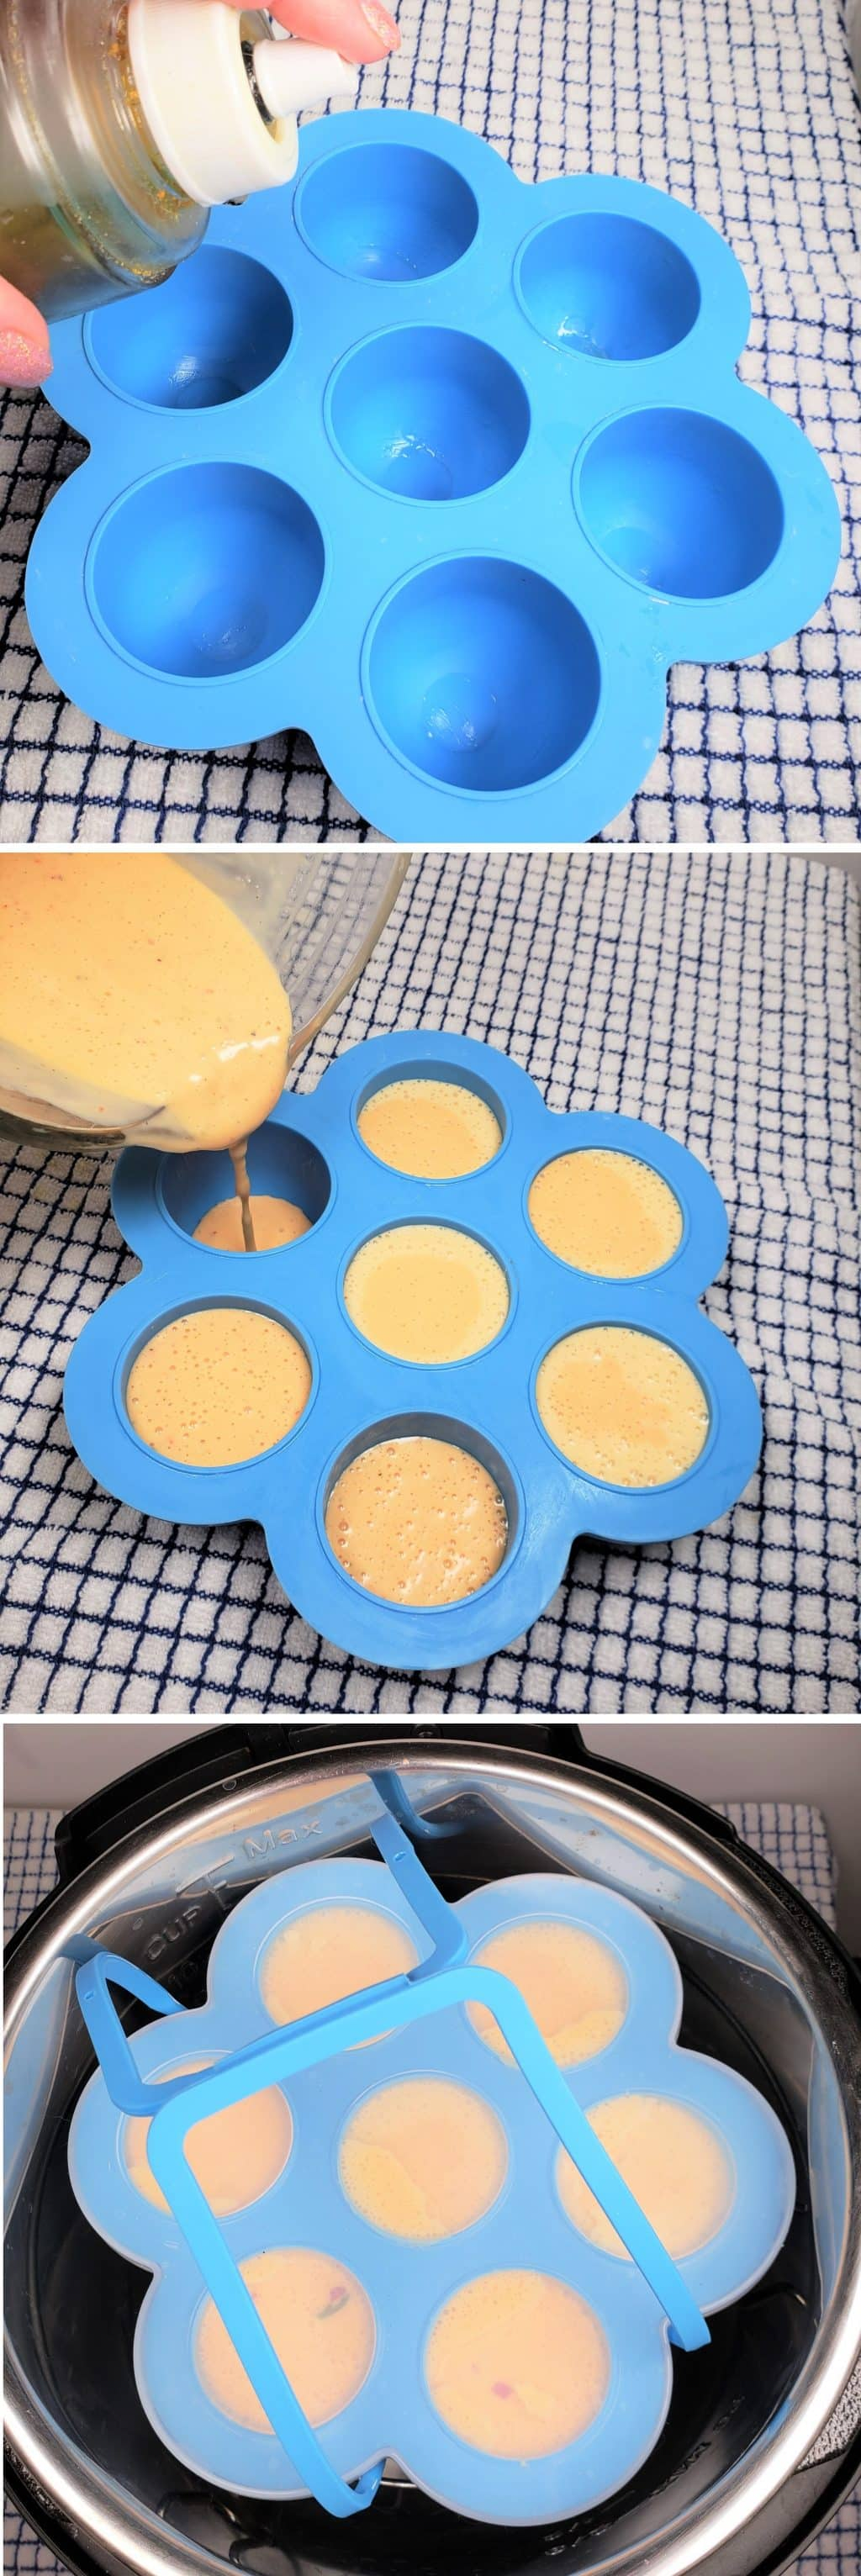 Fill the Egg Bites Tray